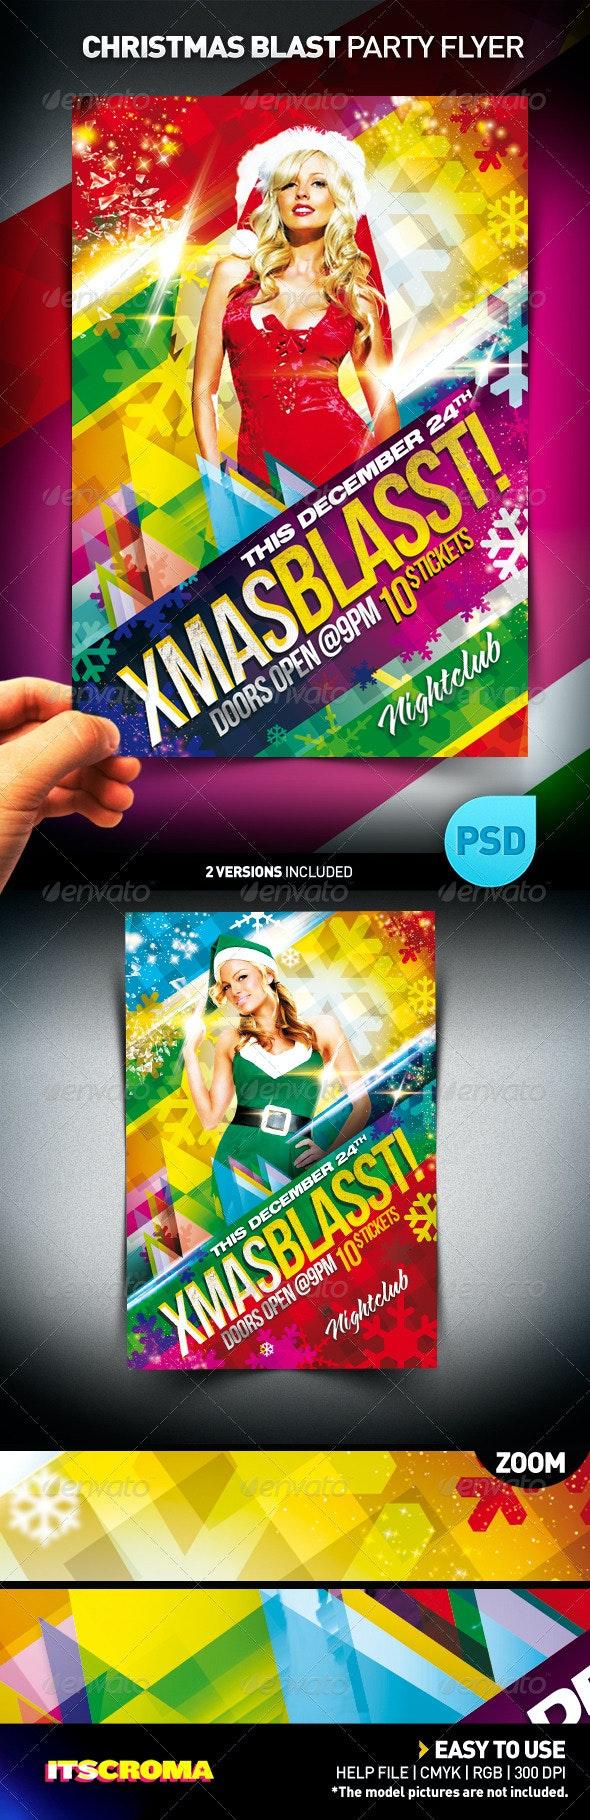 Xmas Blasst Party Flyer - Clubs & Parties Events